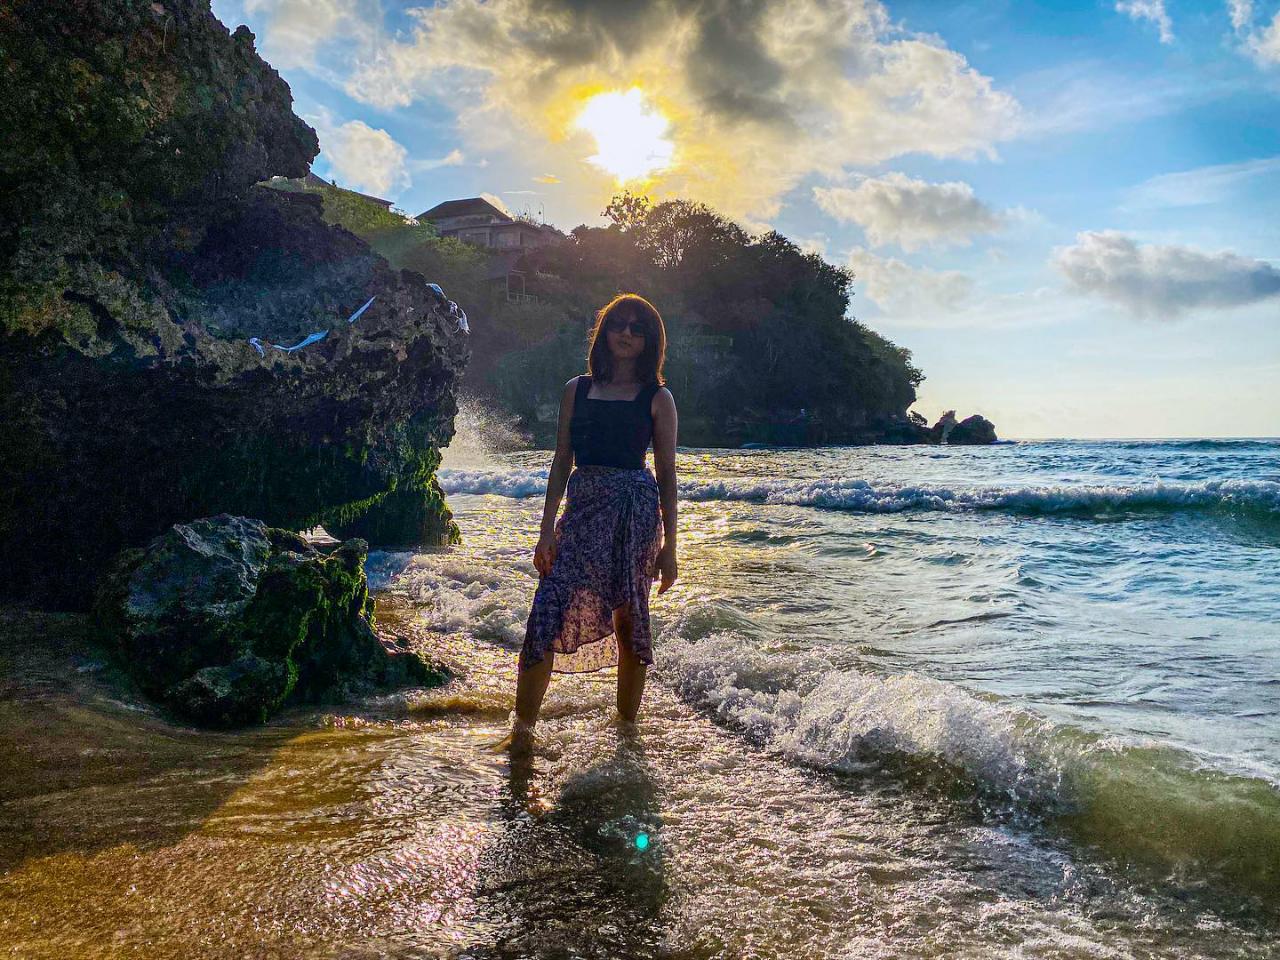 10 Potret Sarah Viloid, Gamer Cantik Asal Indonesia yang Bikin Gagal Fokus